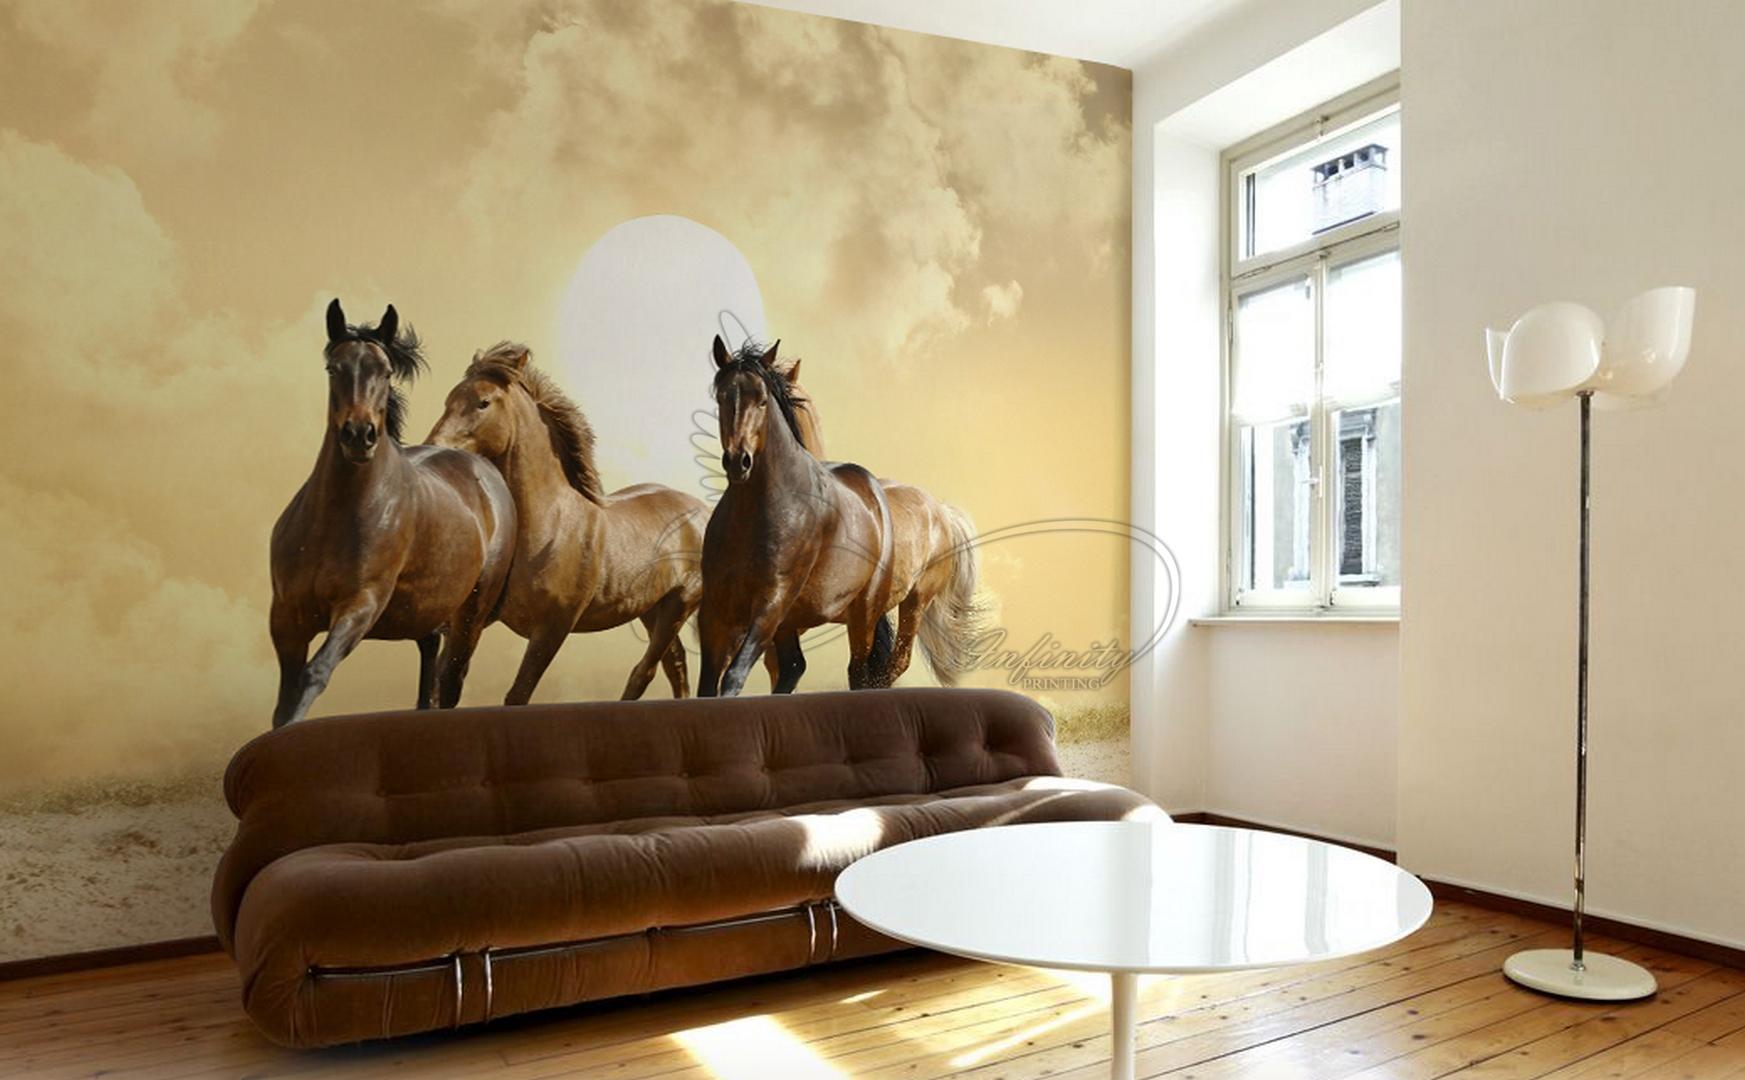 Free open layer mocap design for living room number 77